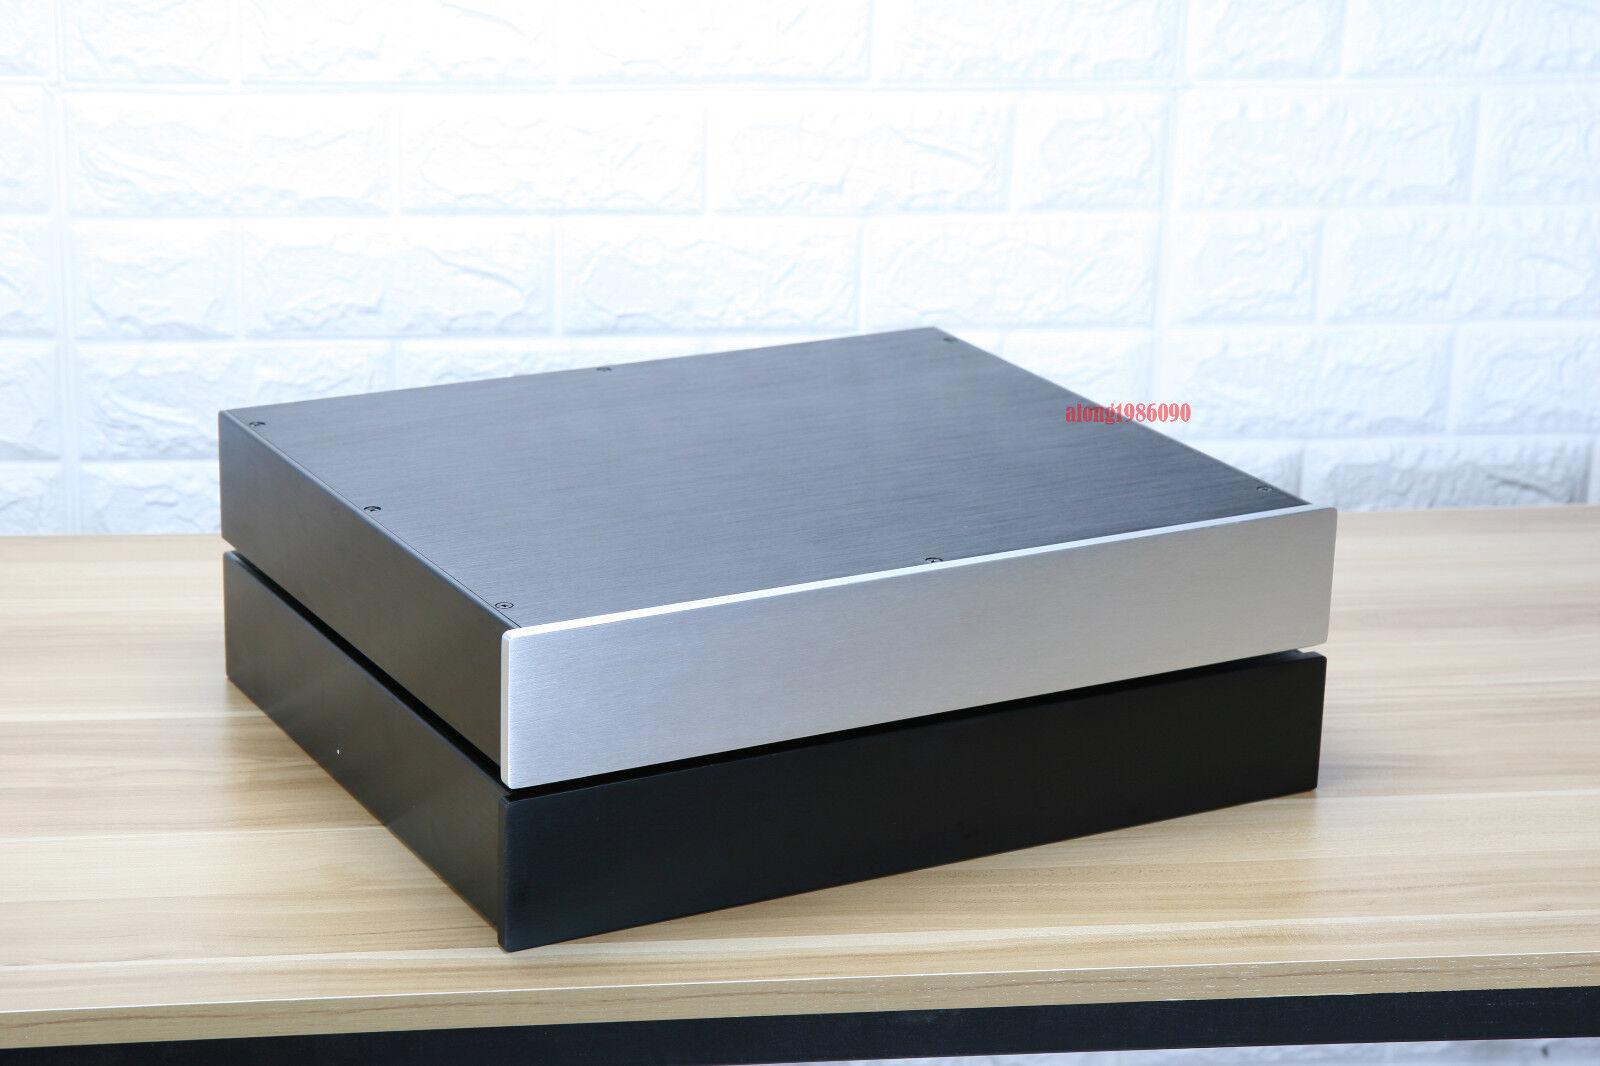 case 1105 Full Aluminum delicate Enclosure Preamp box// PSU chassis DIY